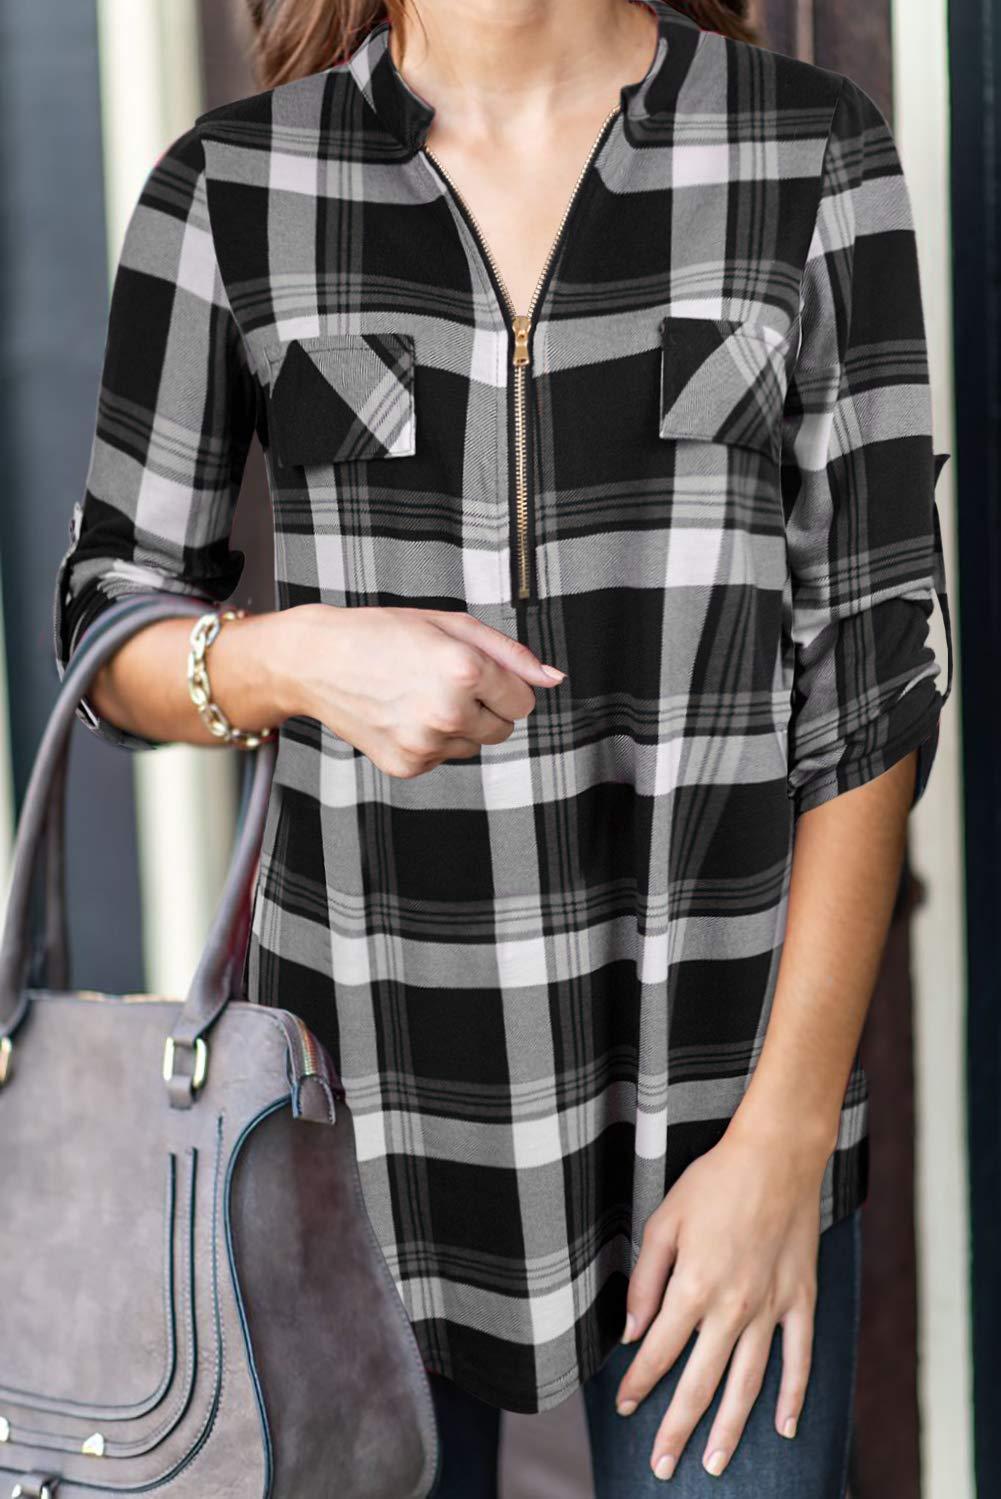 Odosalii Kvinnor Zip Up Pläd Tunika Blus Rullad Ärm Polo Top Check Shirts L-#1black